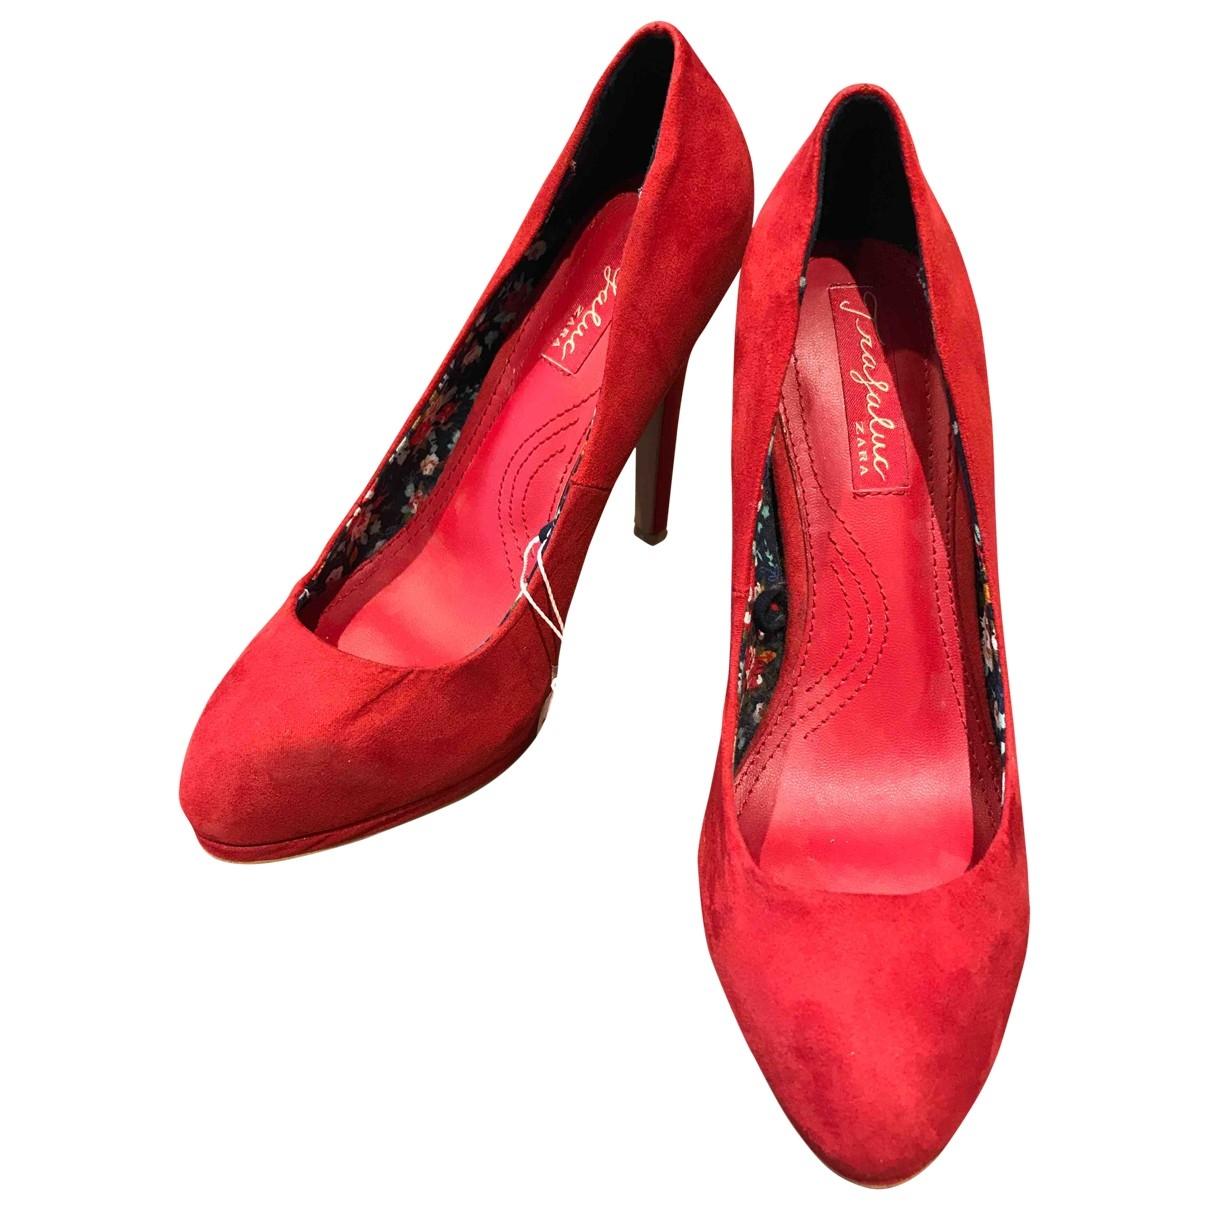 Zara \N Red Suede Heels for Women 37 EU